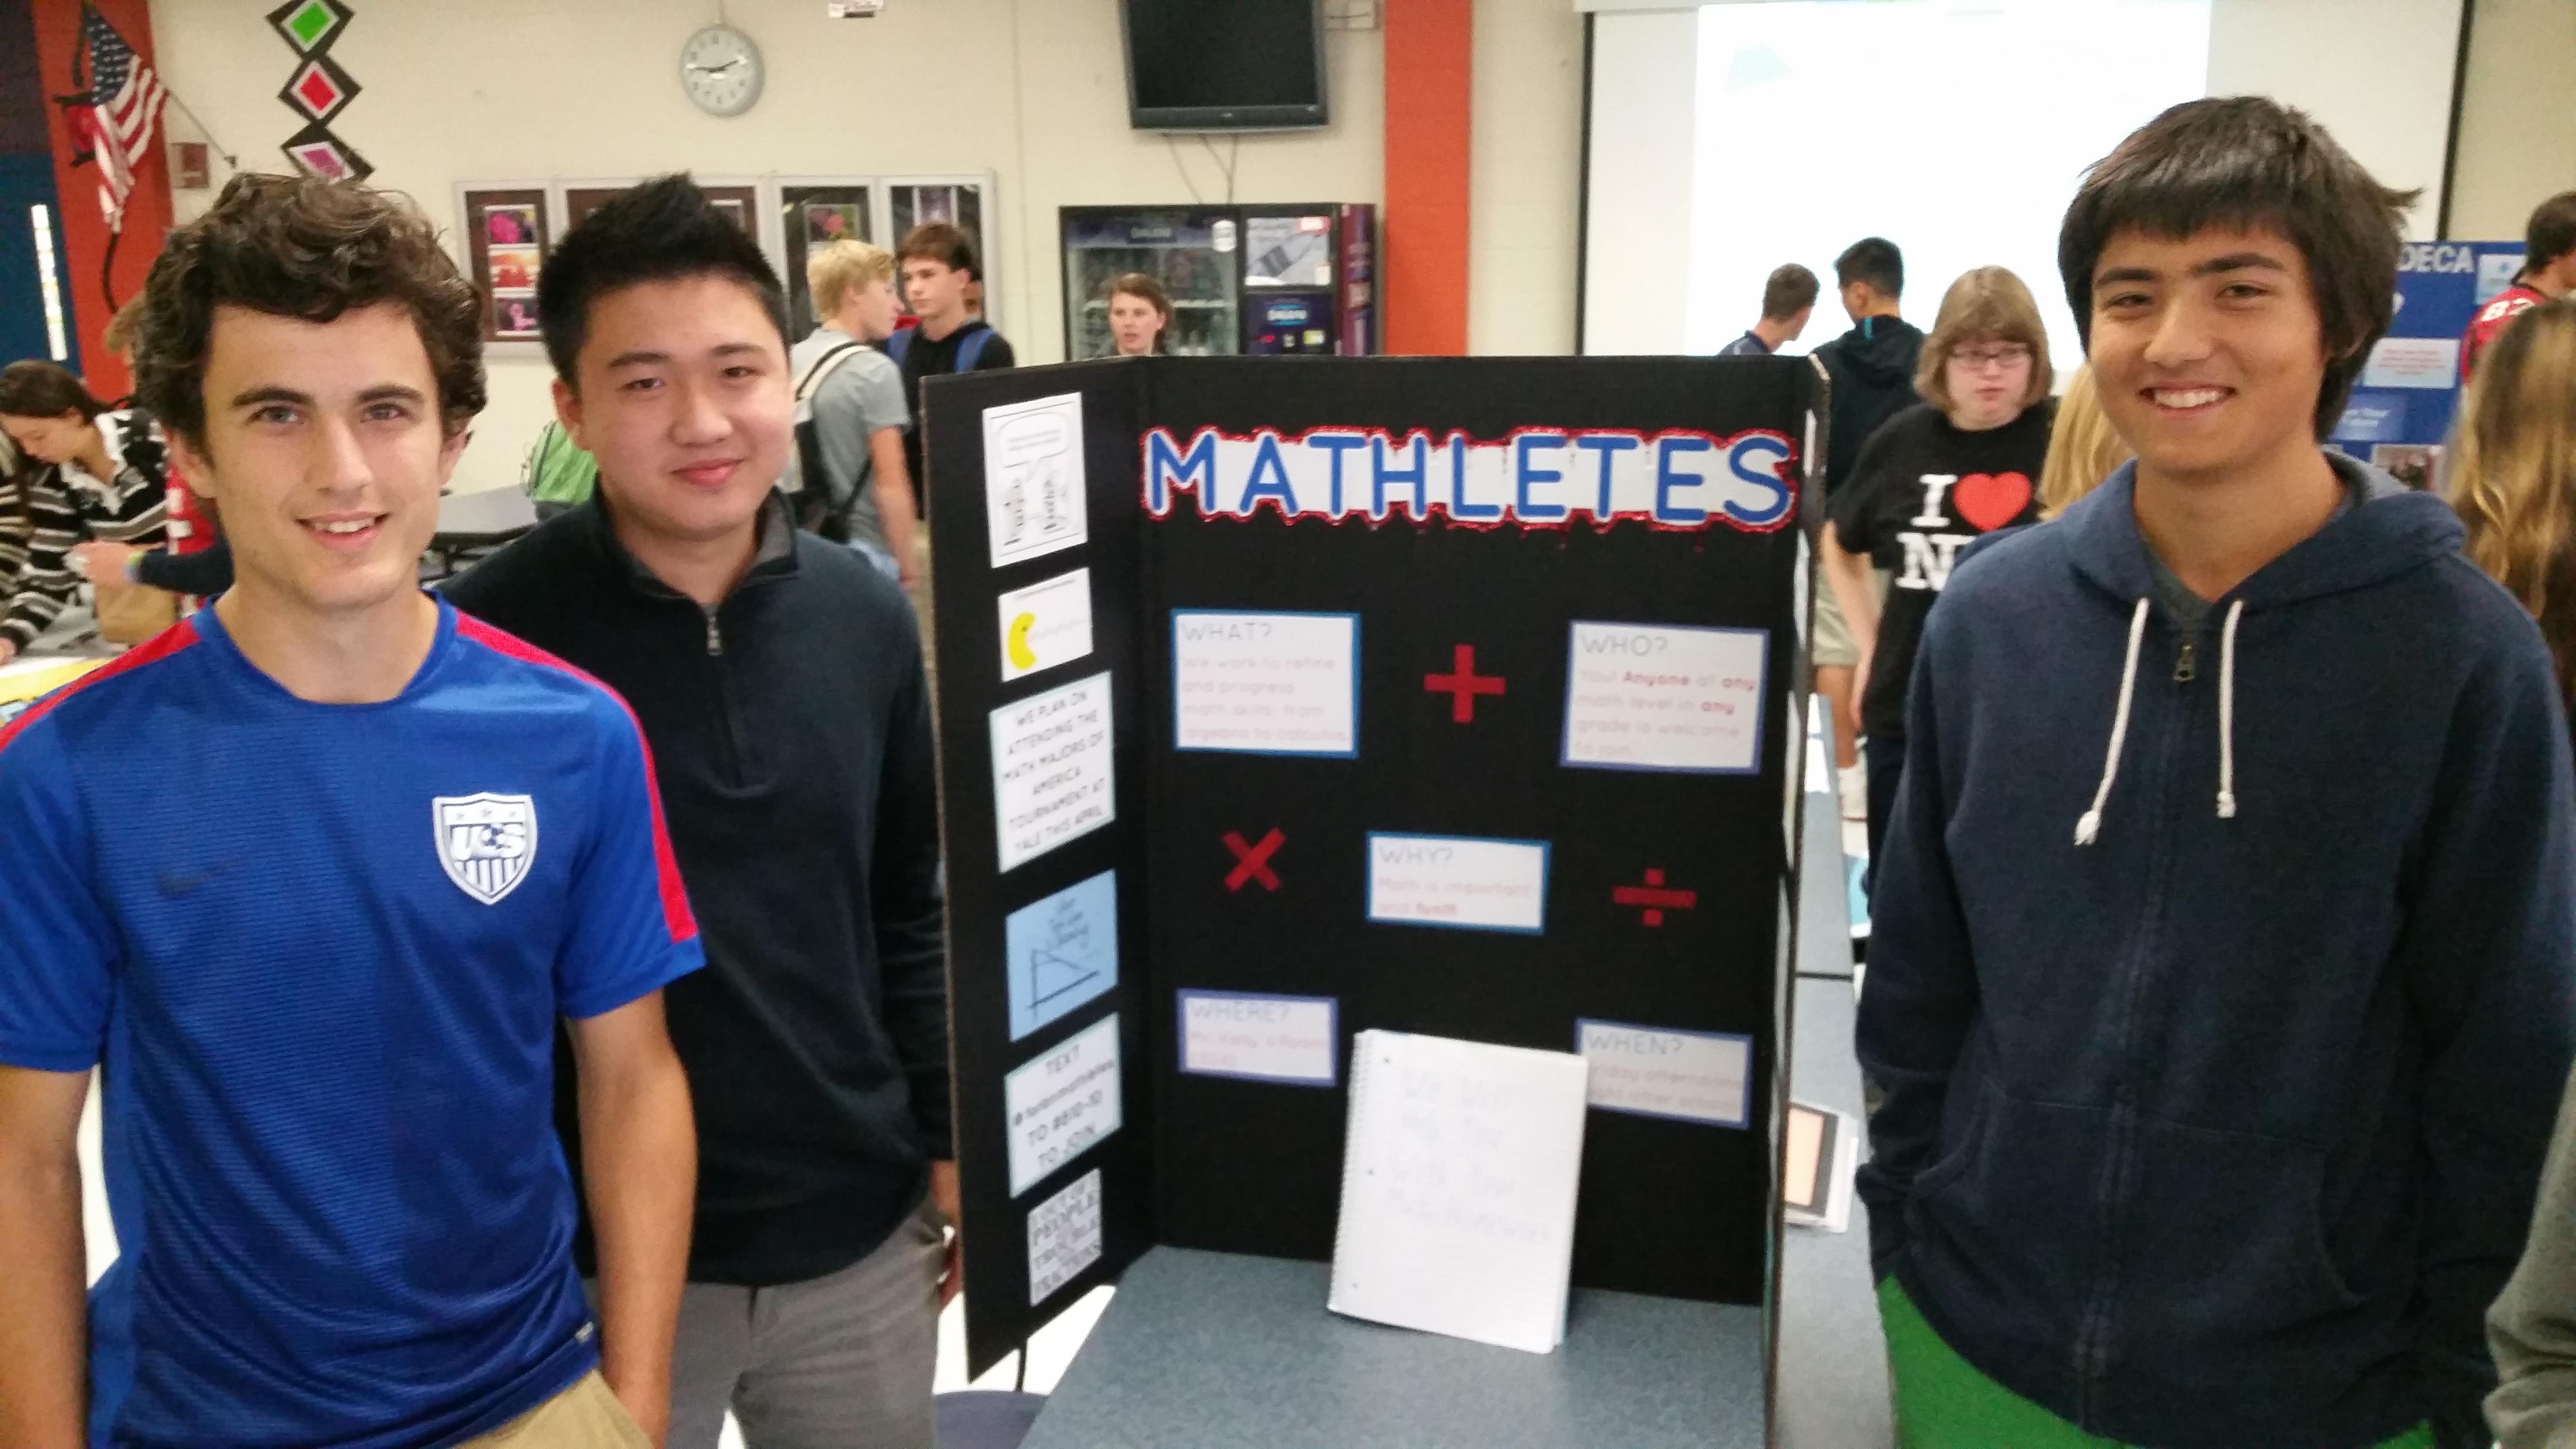 Mathletes Picture.jpg